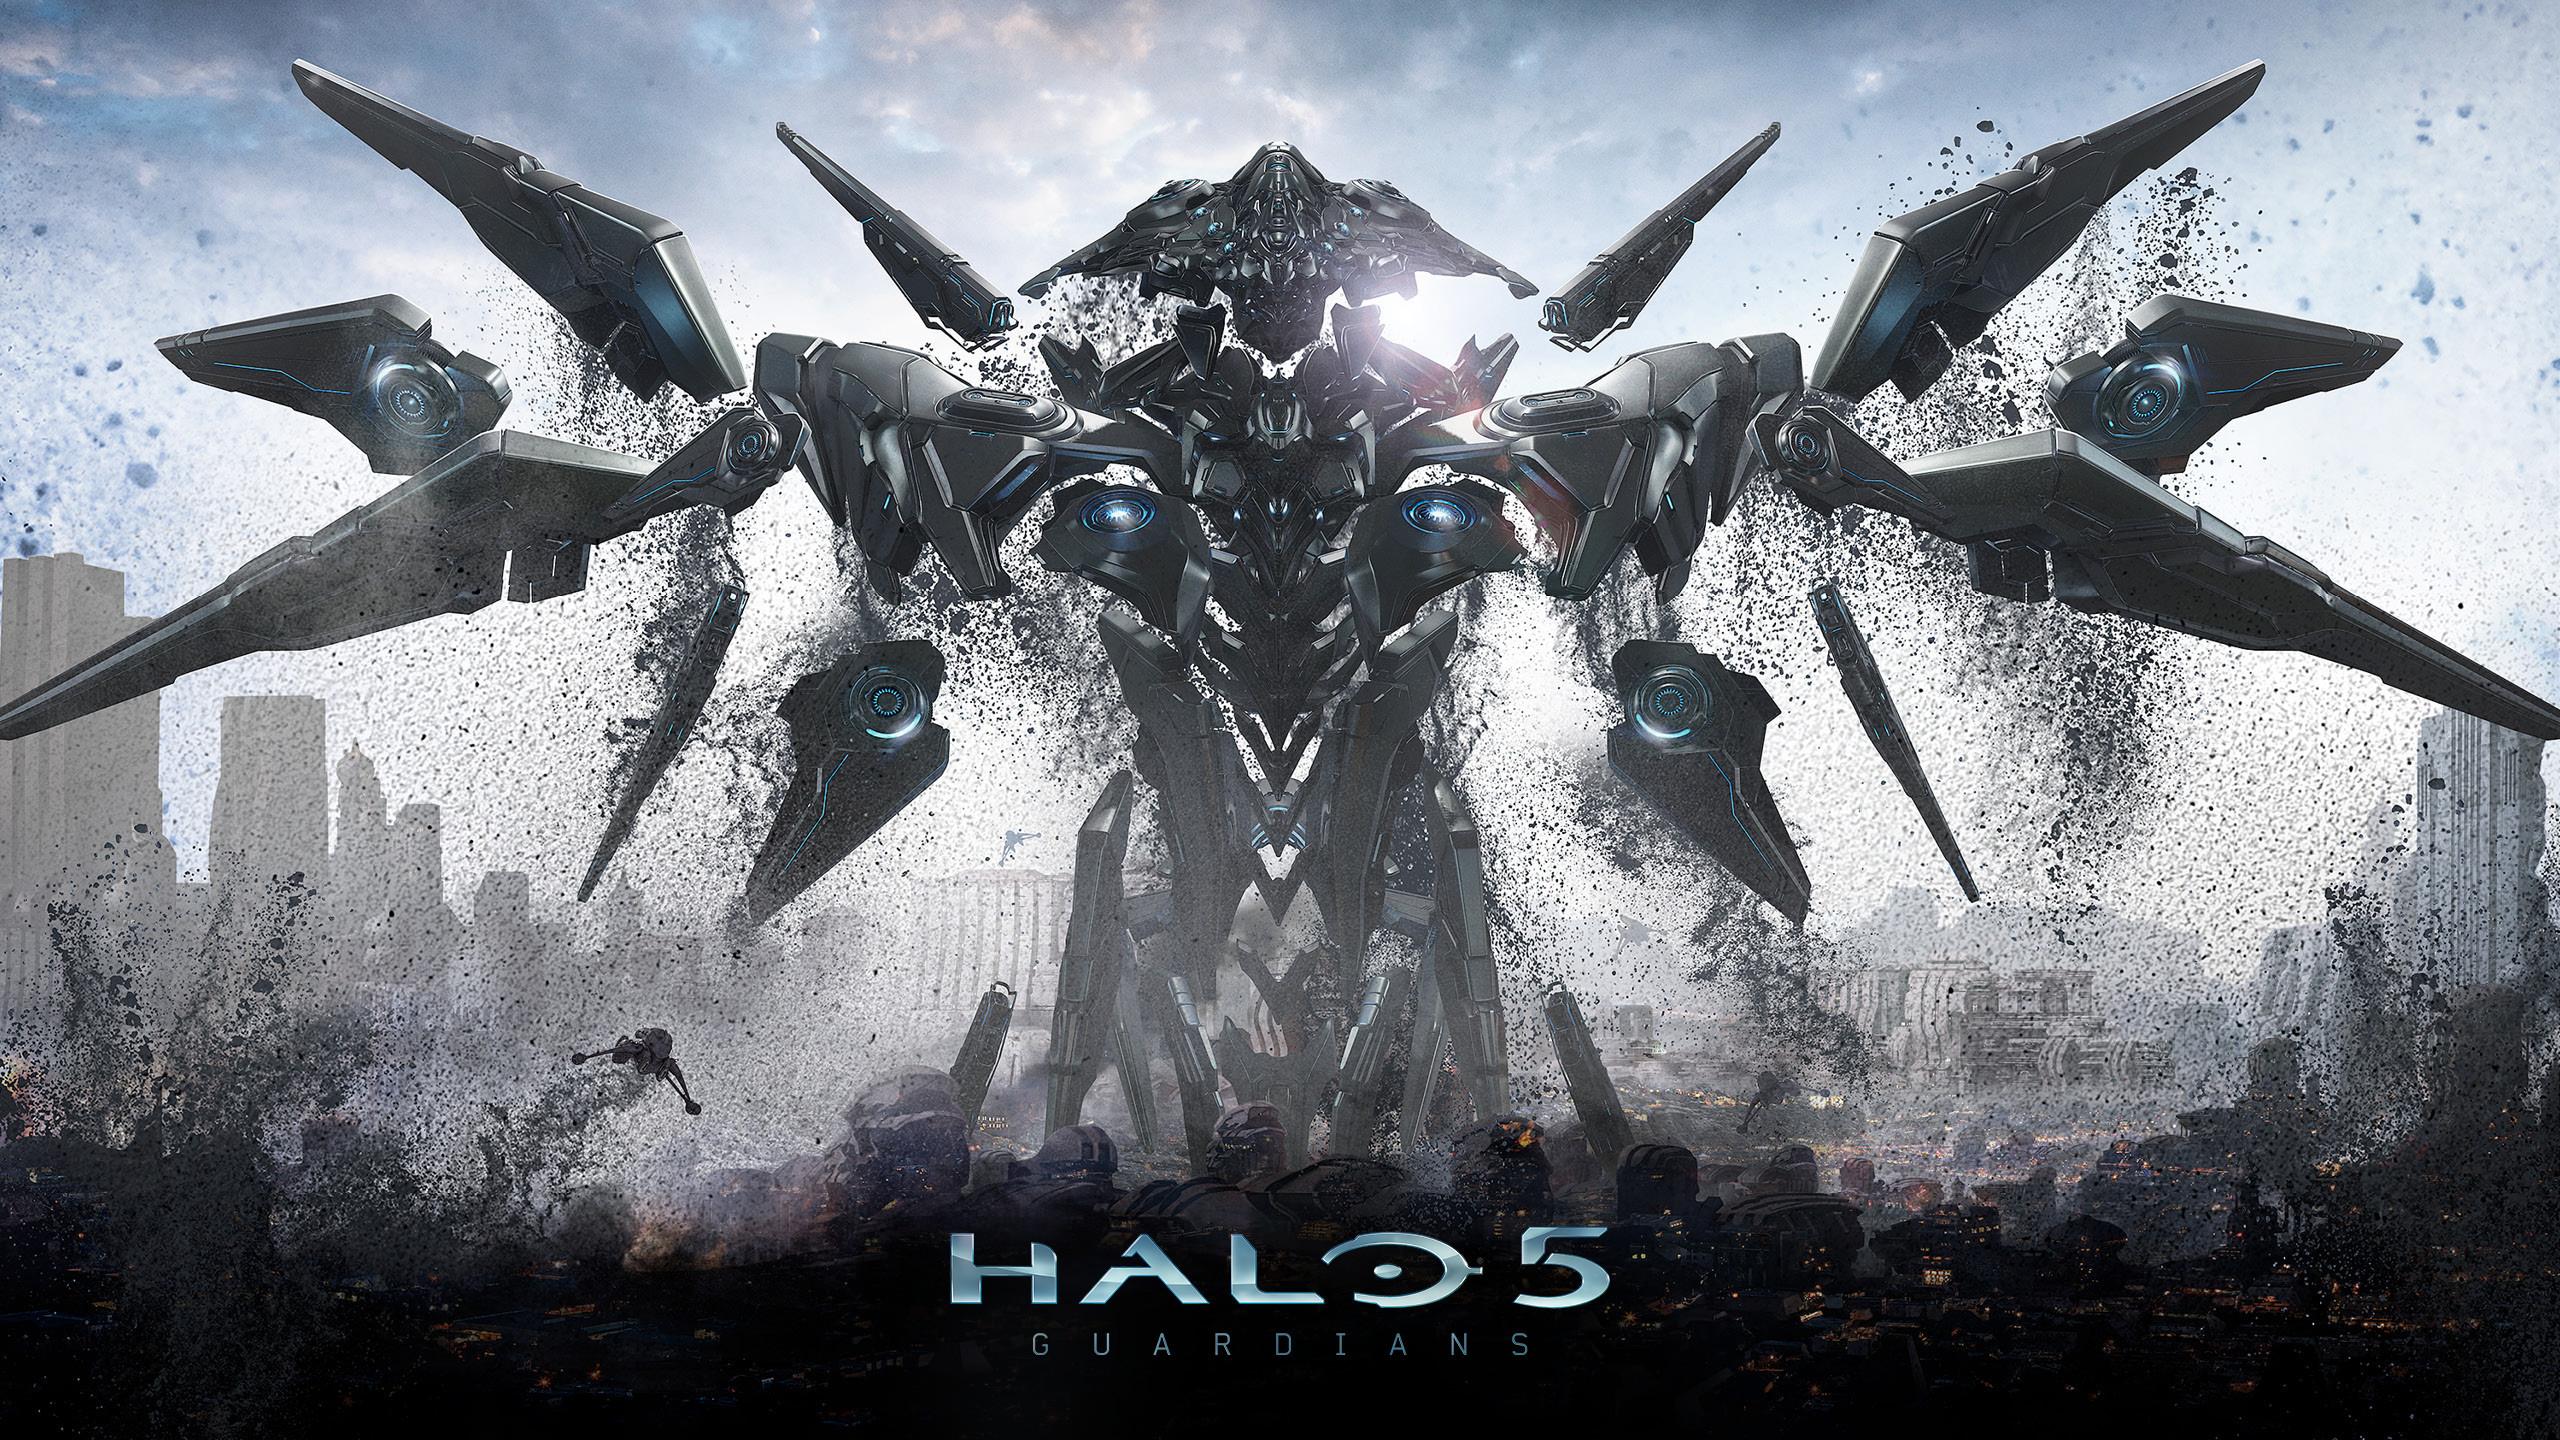 Guardian Halo 5 Guardians